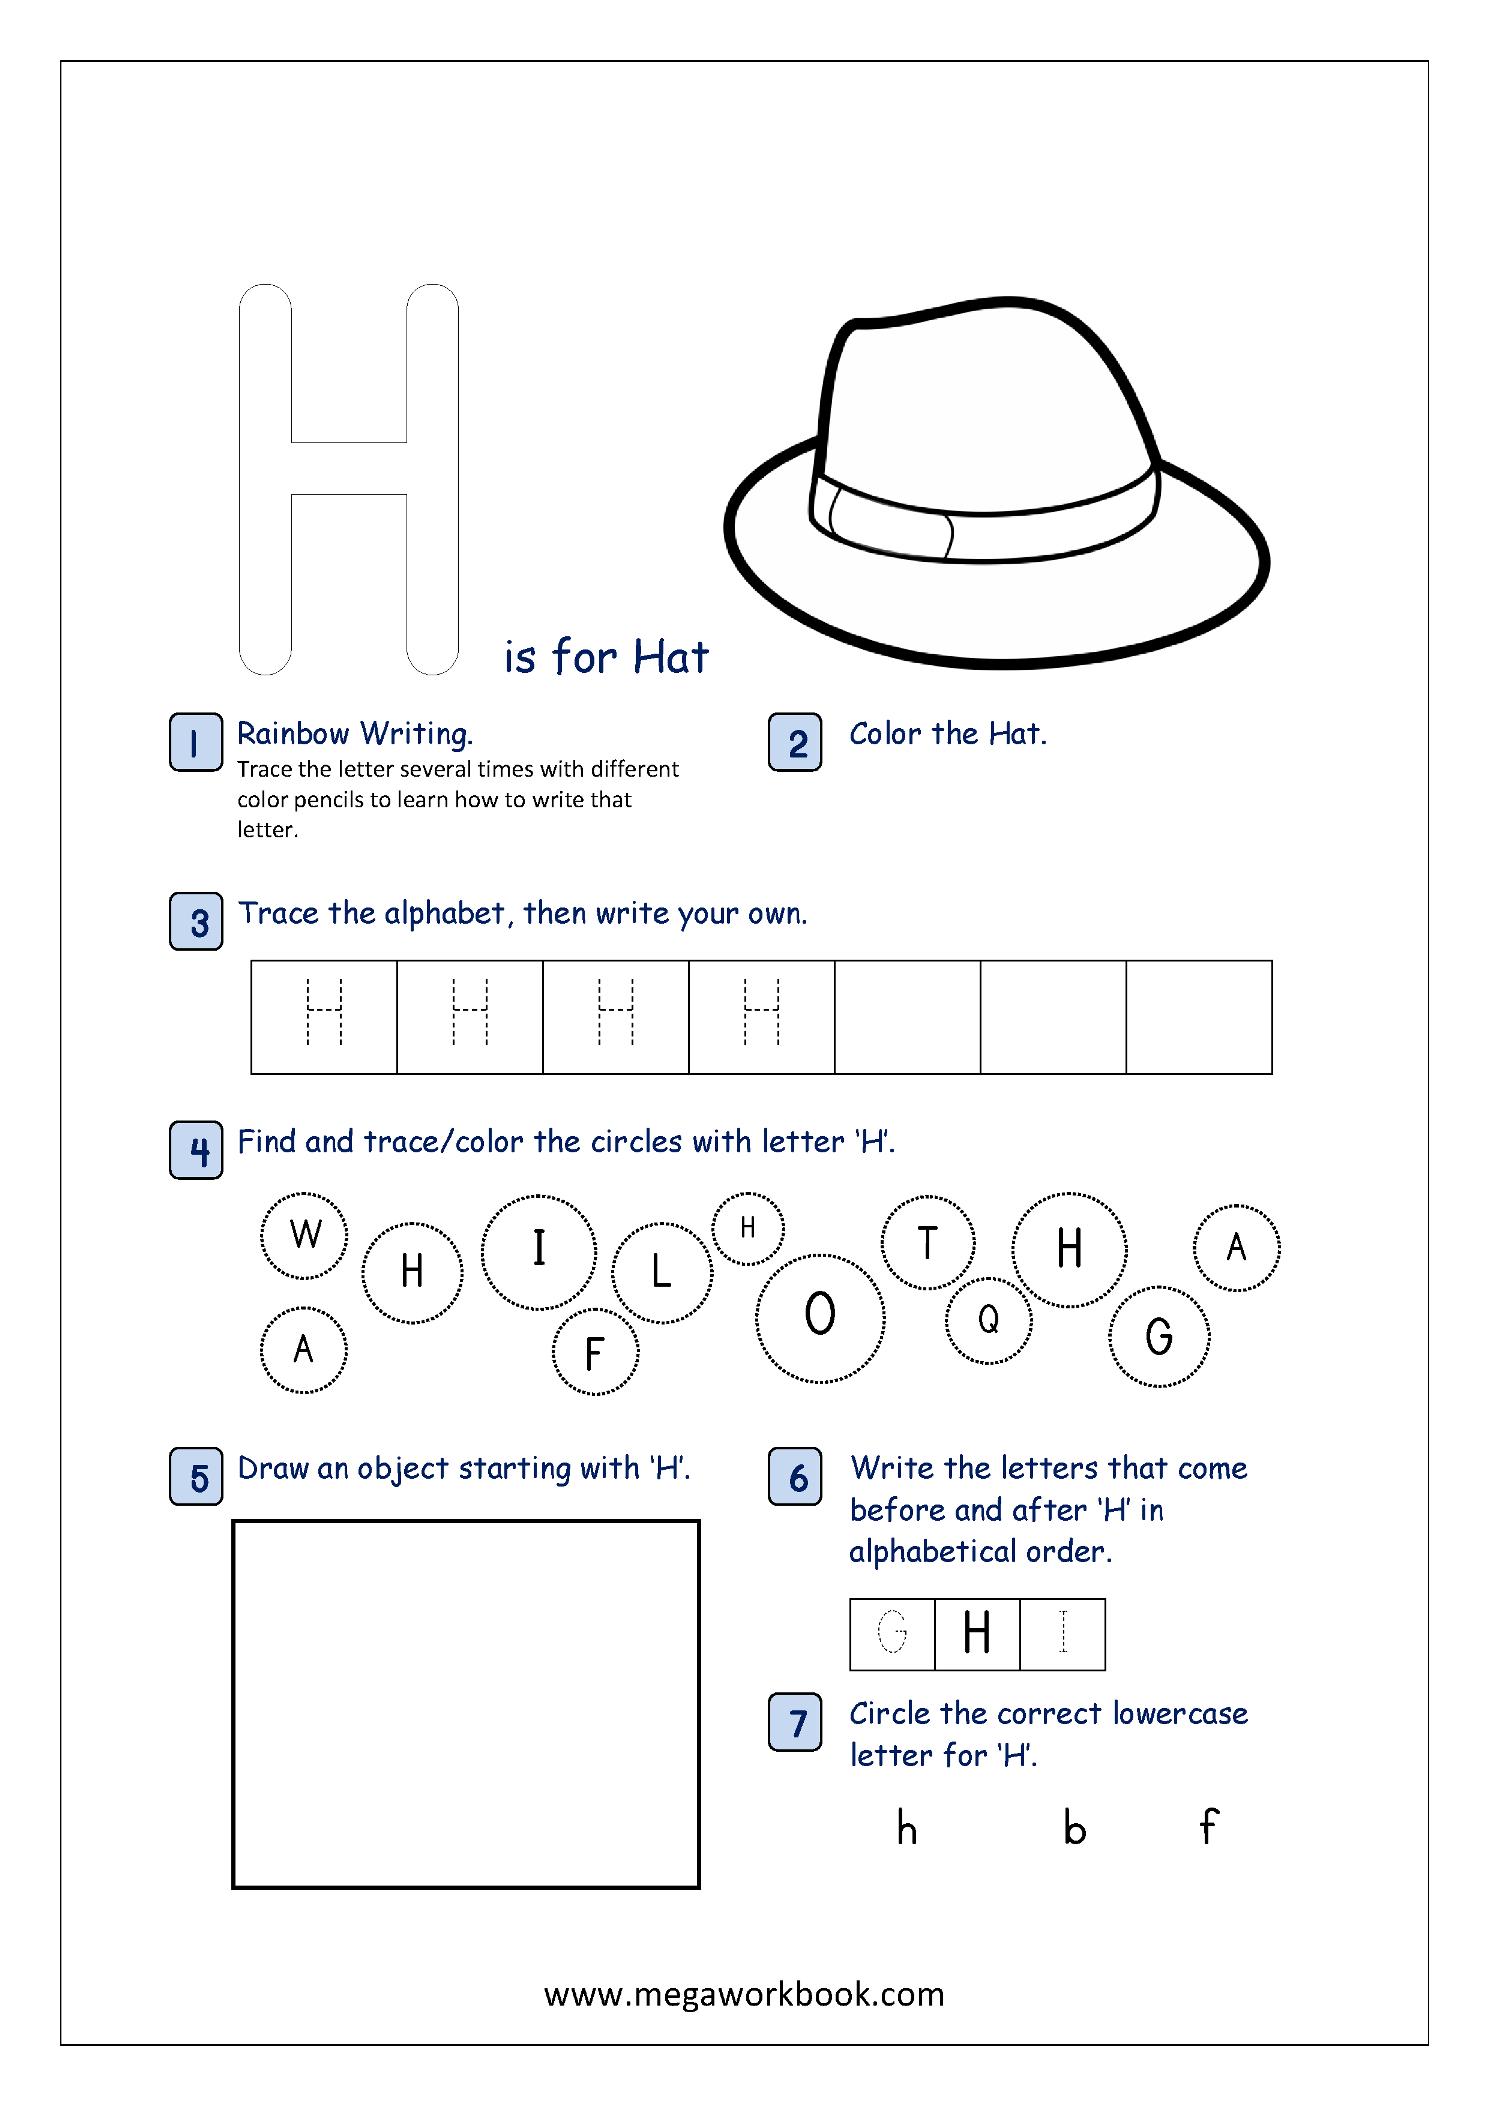 b52ed861415 ... Alphabet Recognition Activity Worksheet - Capital Letter - H For Hat ...